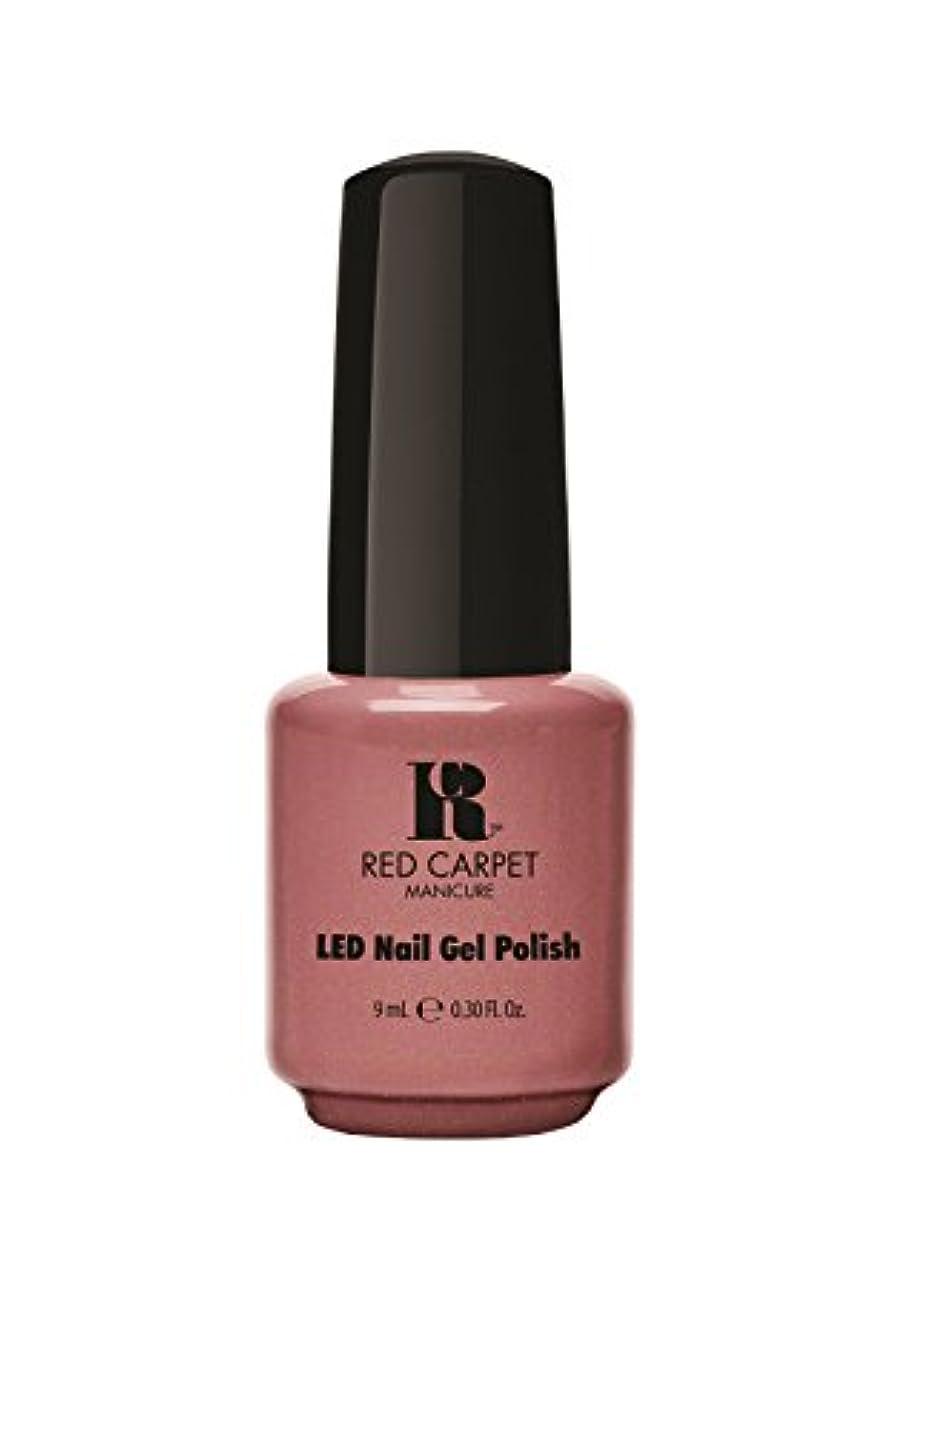 Red Carpet Manicure - LED Nail Gel Polish - Class Act - 0.3oz/9ml